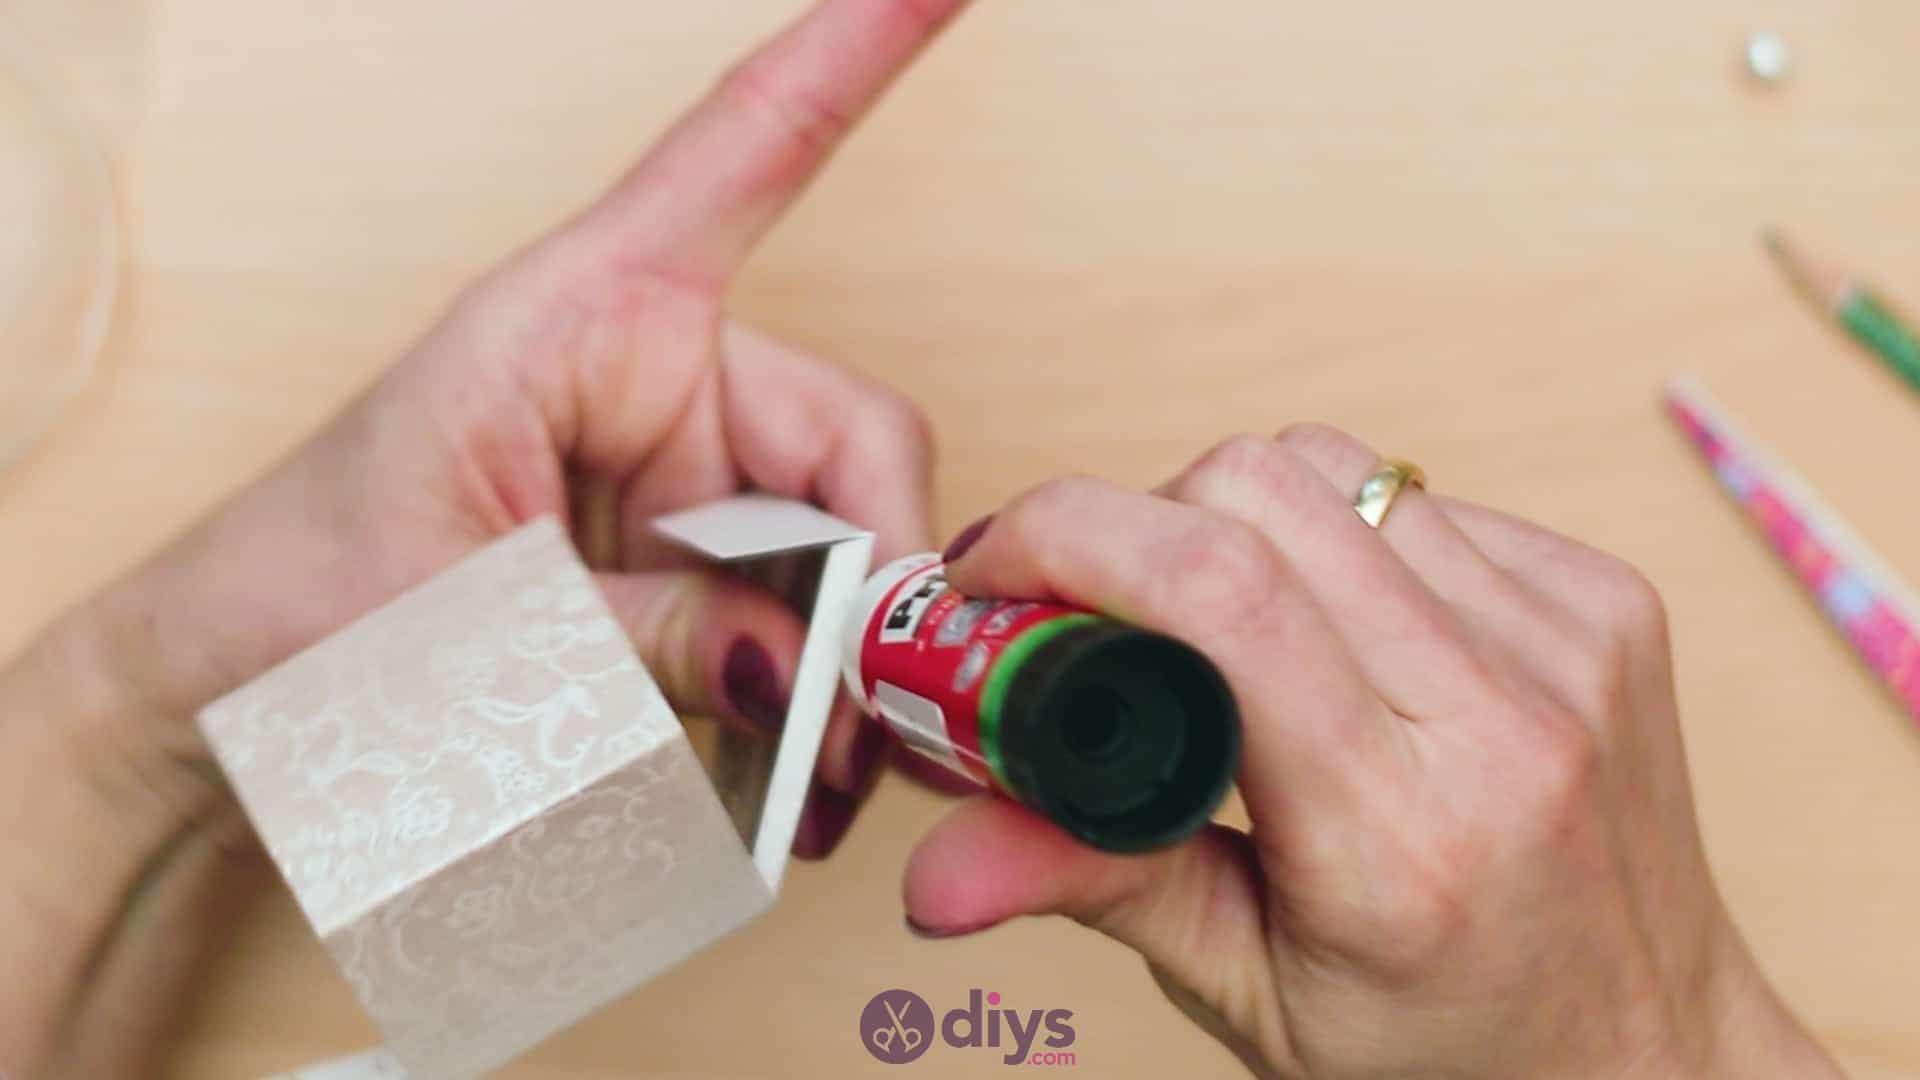 Diy mini wedding gift box step 6a